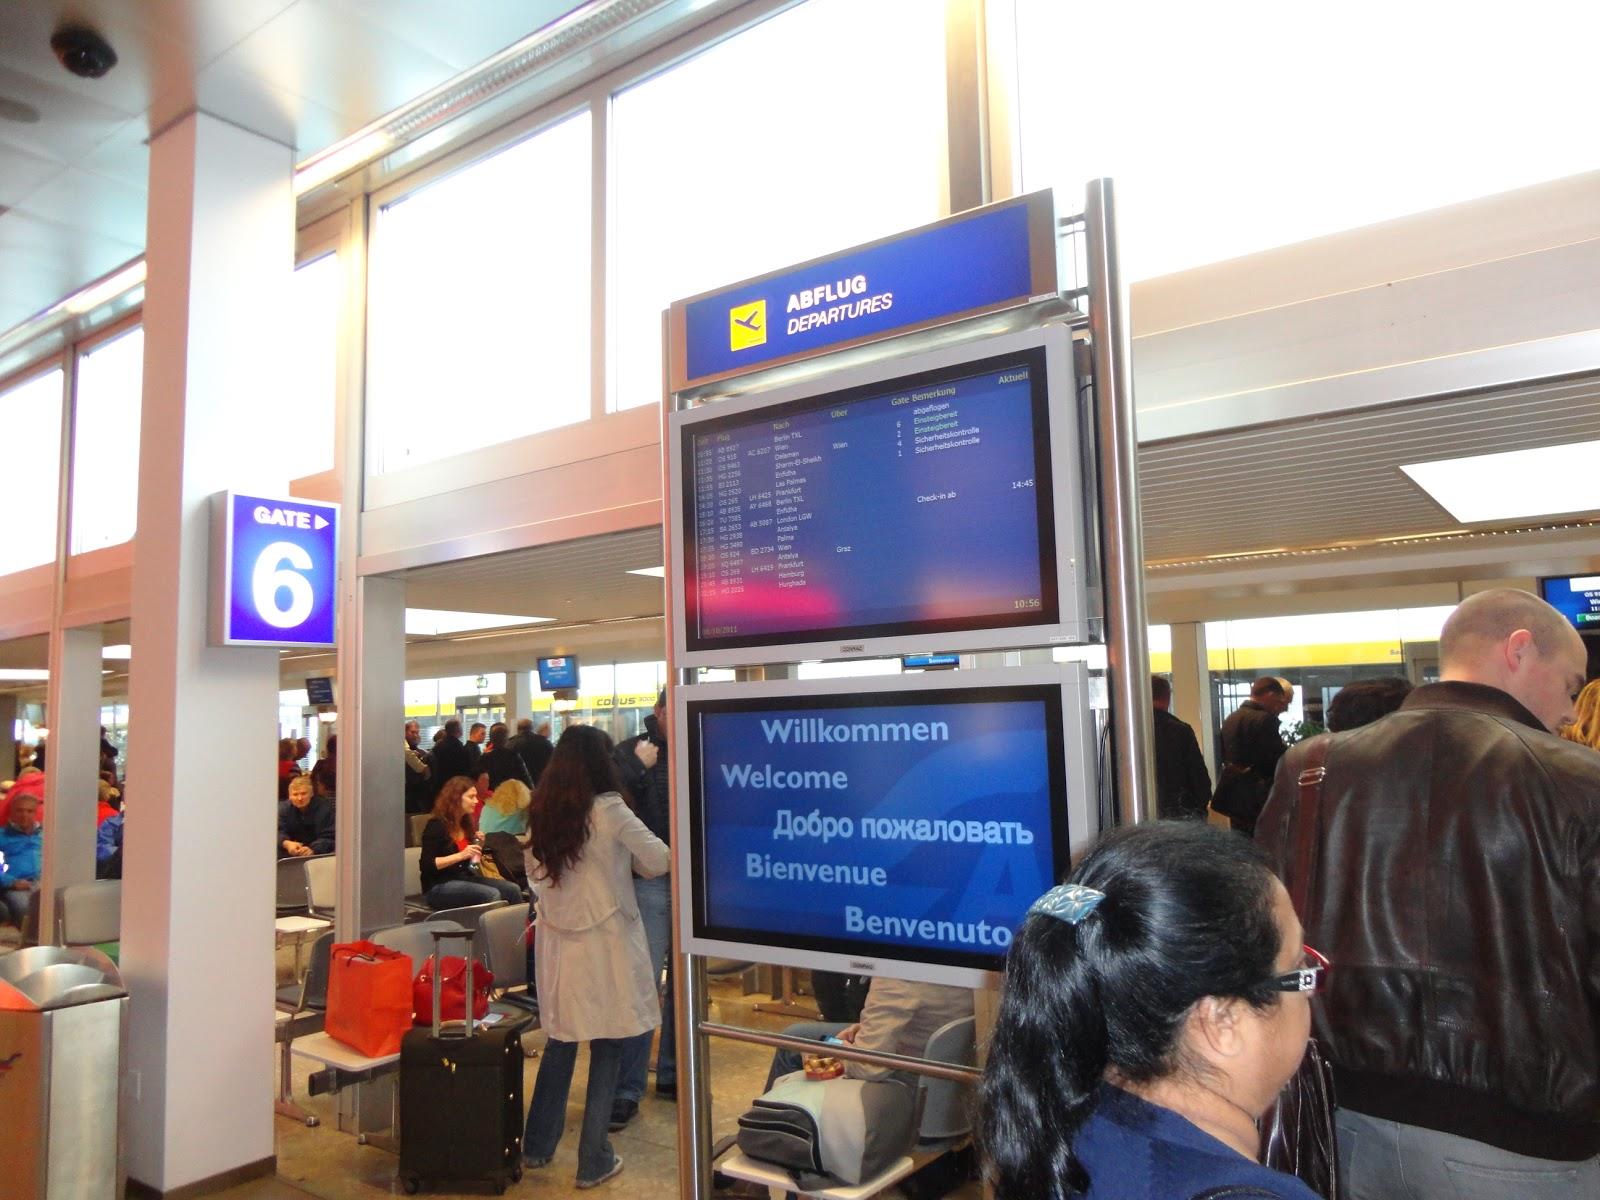 Departure Lounge at WA Mozart Airport Salzburg Austria